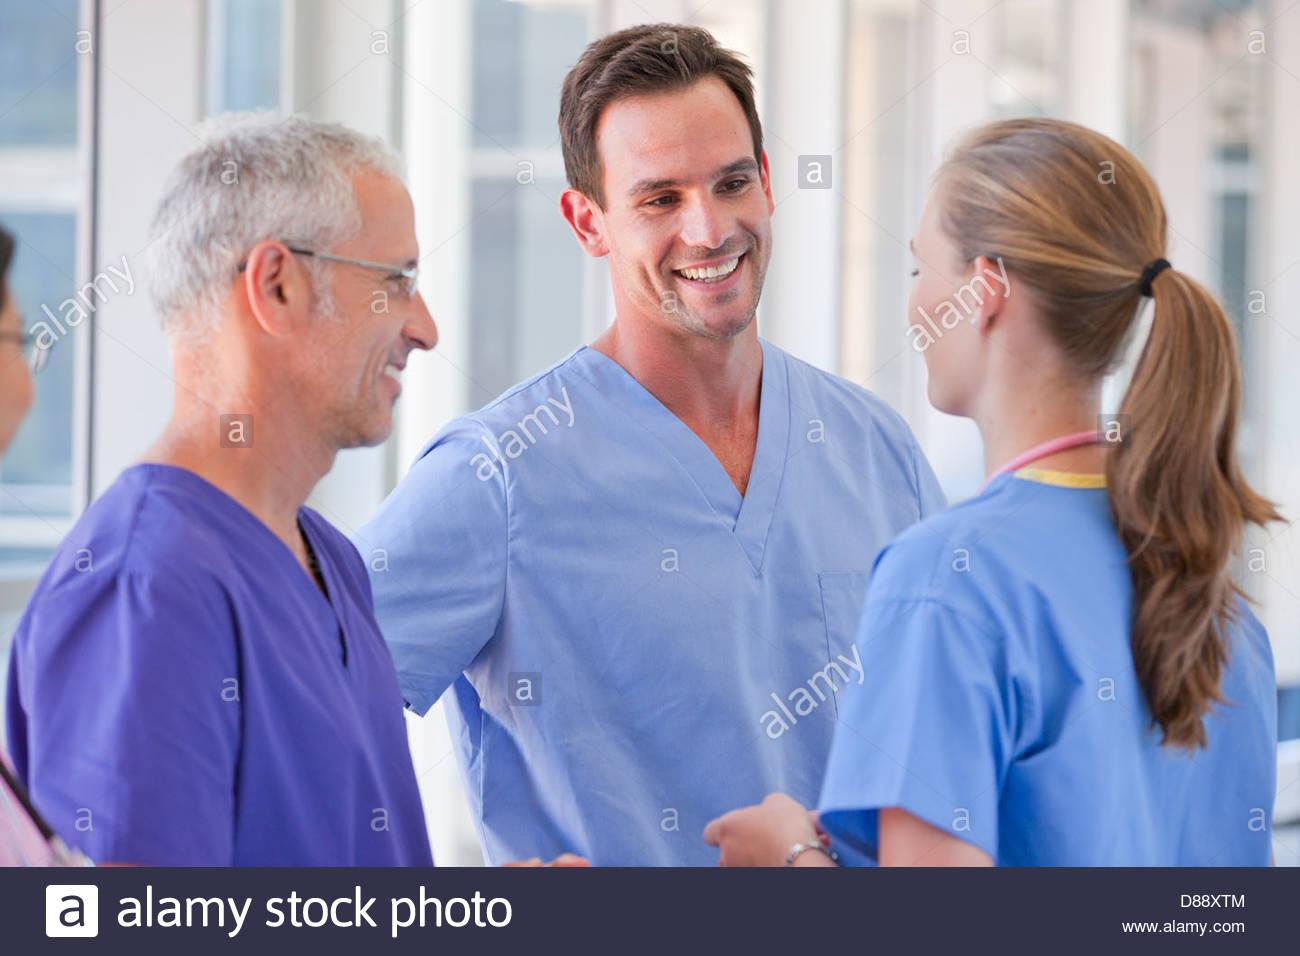 Smiling doctors talking - Stock Image